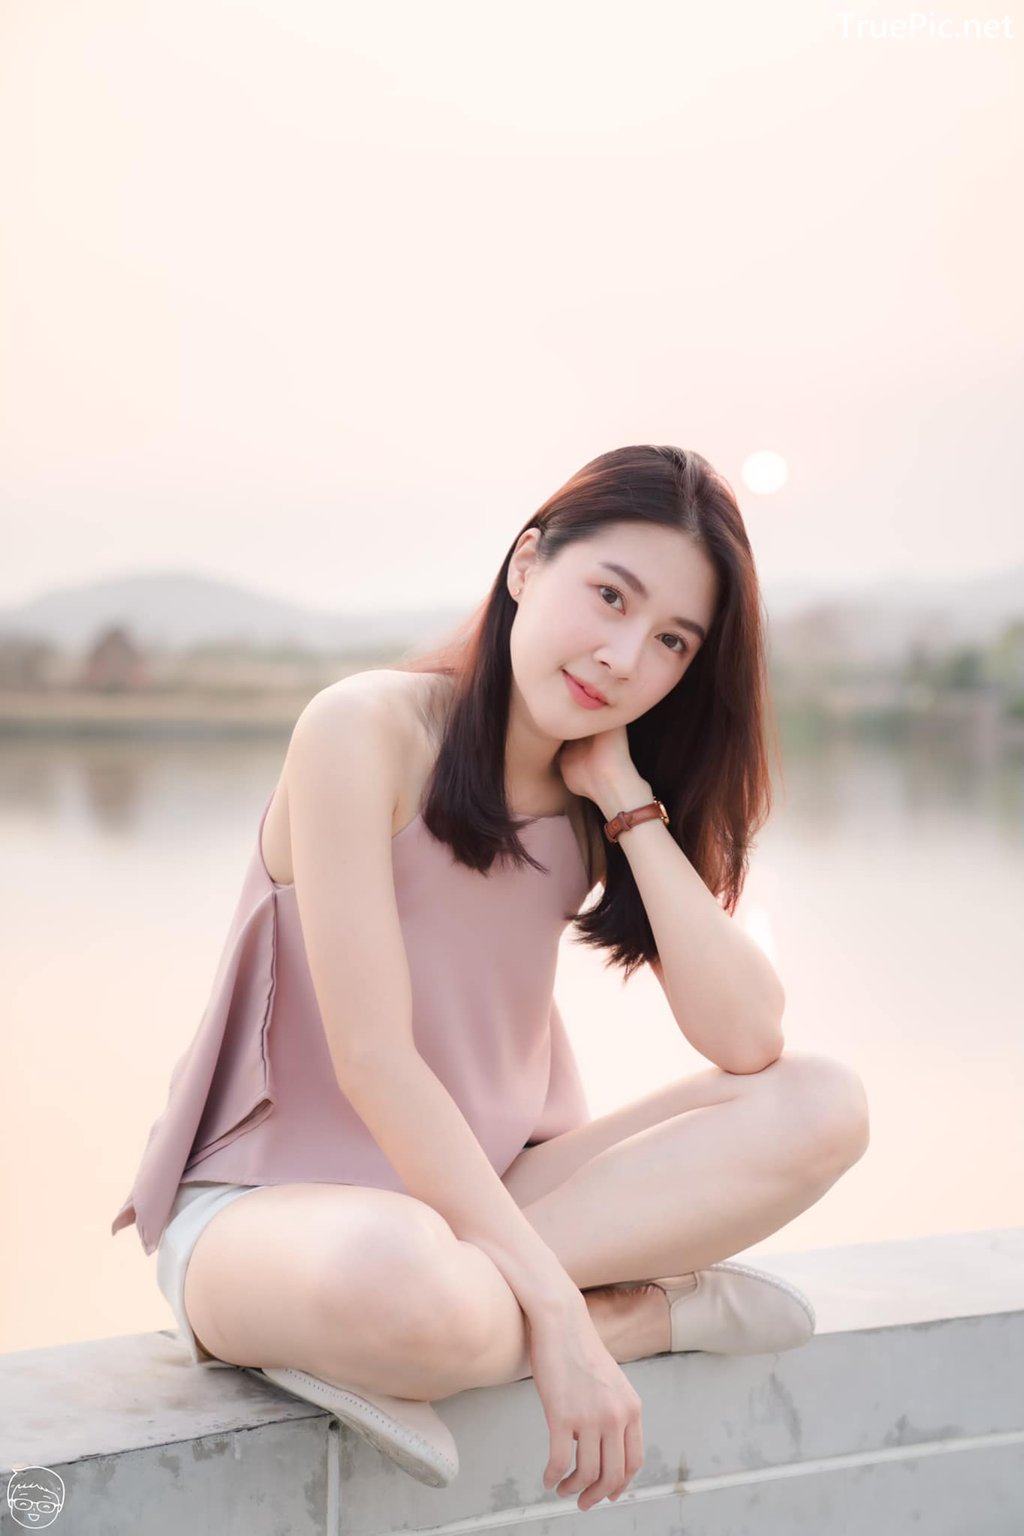 Image Thailand Model - Namlom Homhuan - Sweet Pink - TruePic.net - Picture-6